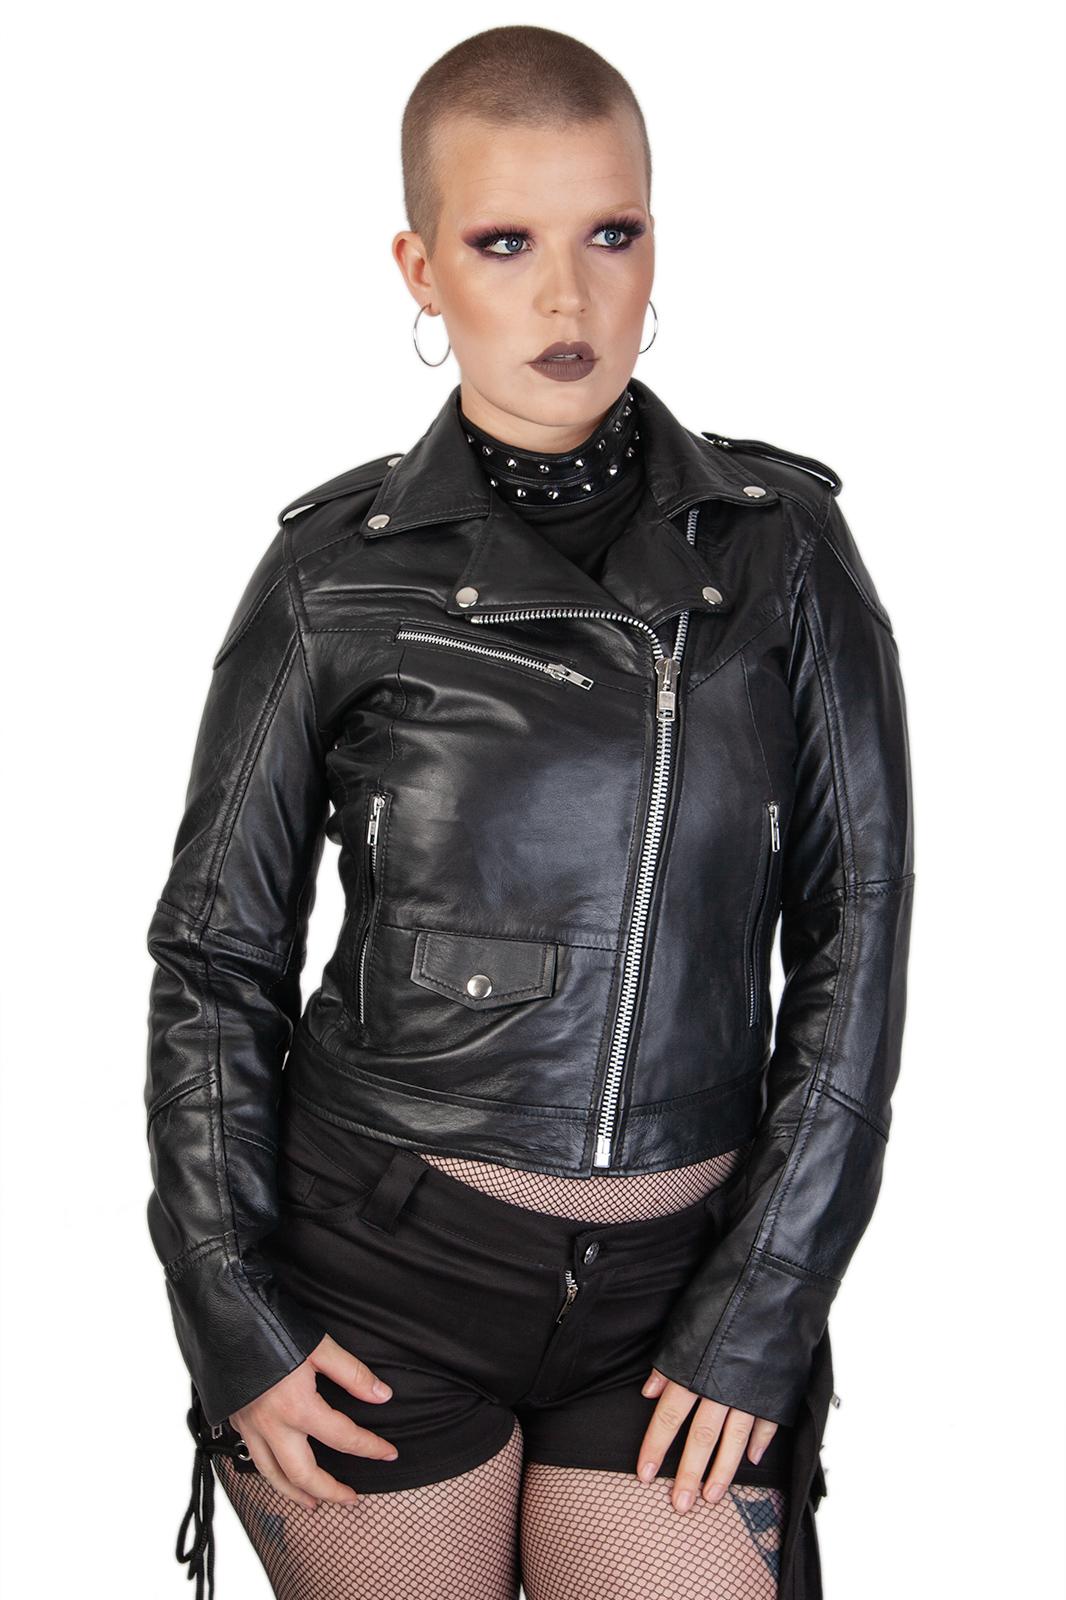 Real Leather Jacker Girls Black